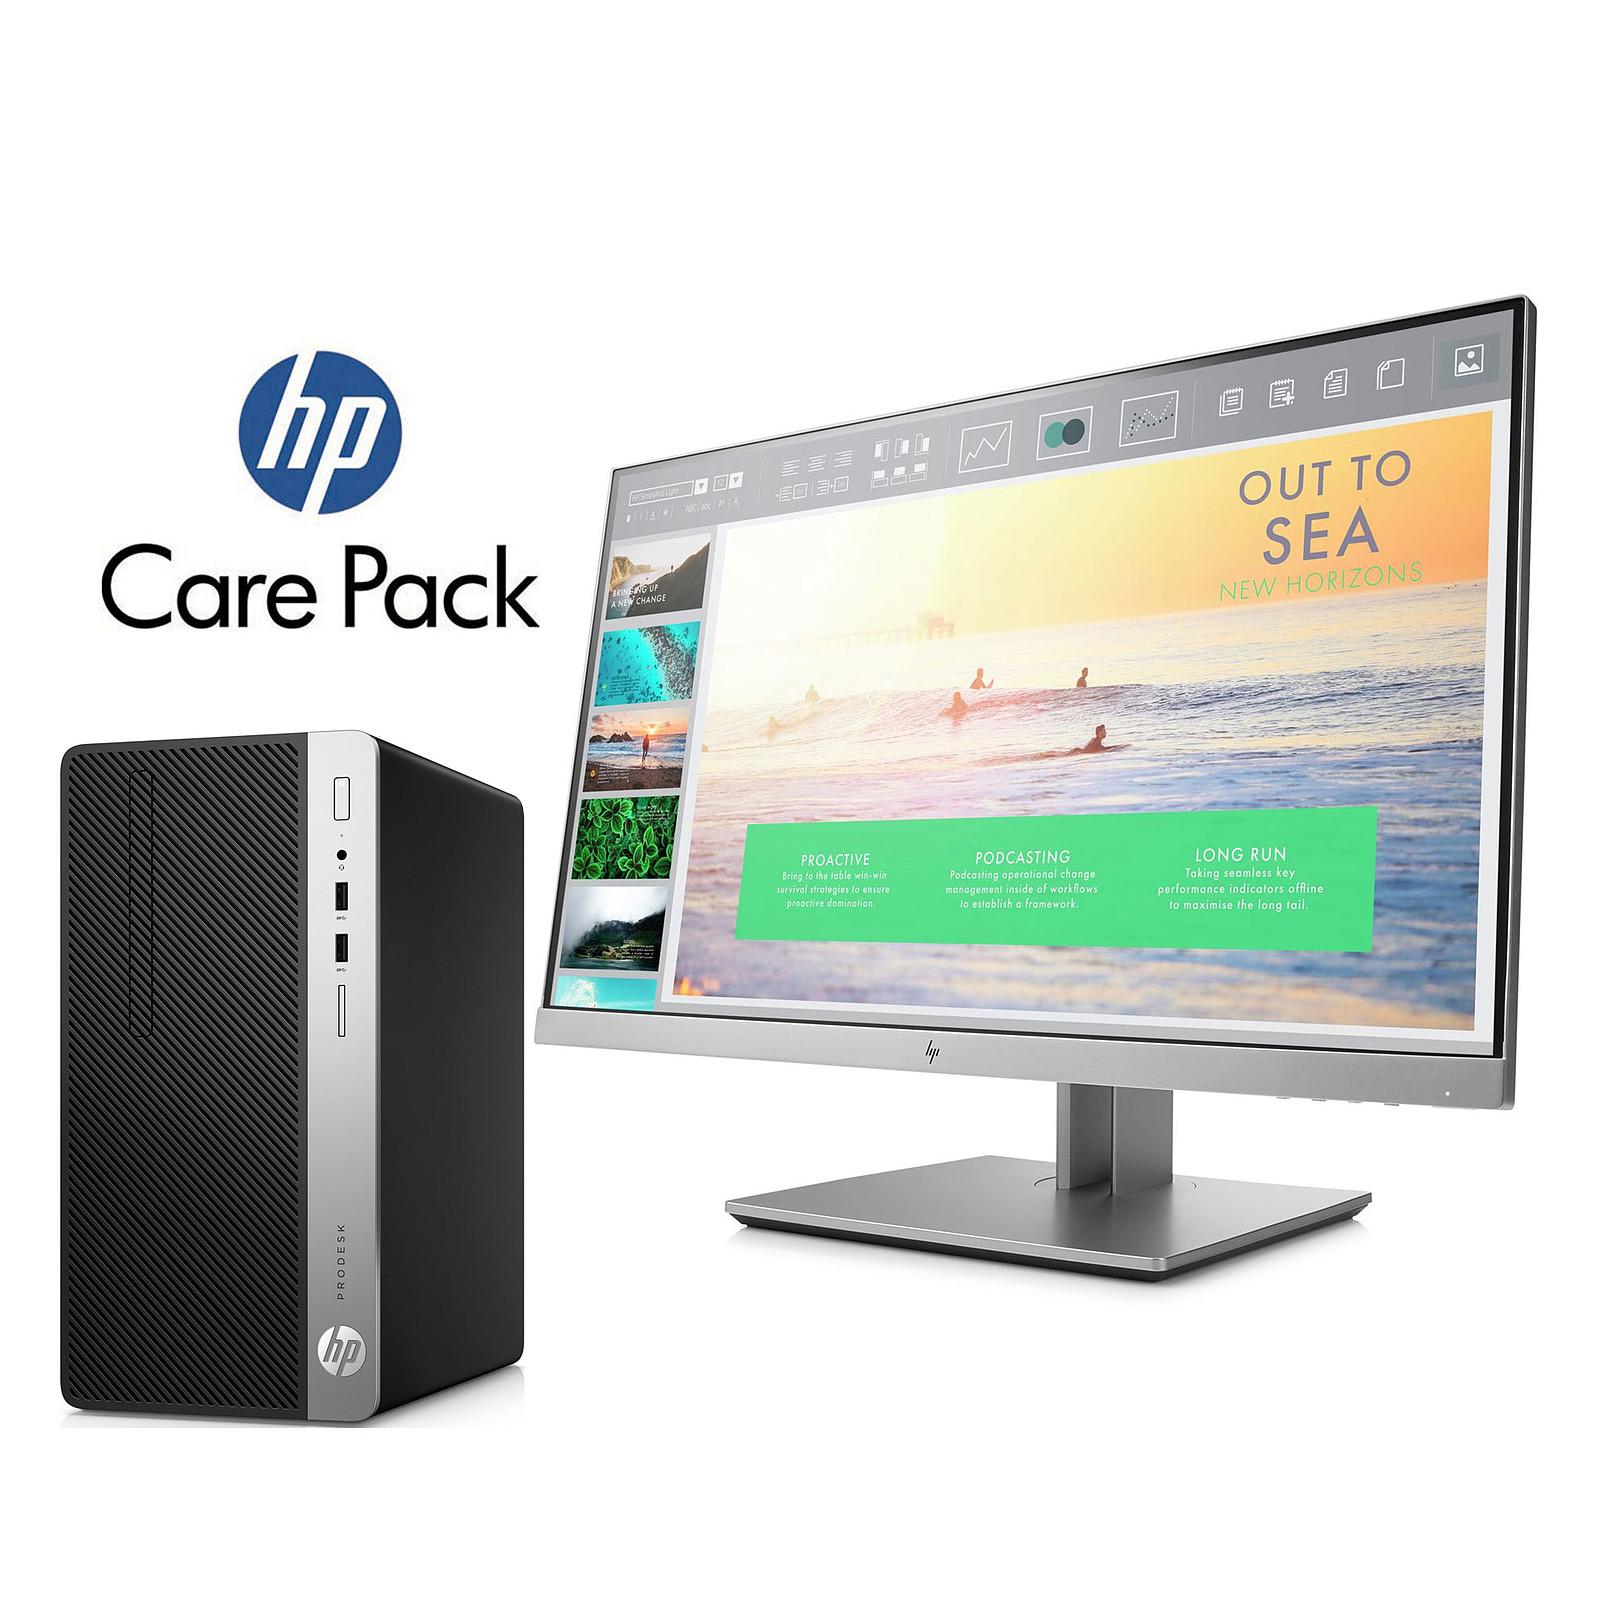 HP ProDesk 400 G5 Micro (4CZ56ET) + HP EliteDisplay E233 + tapis de souris + HP Care Pack U6578A